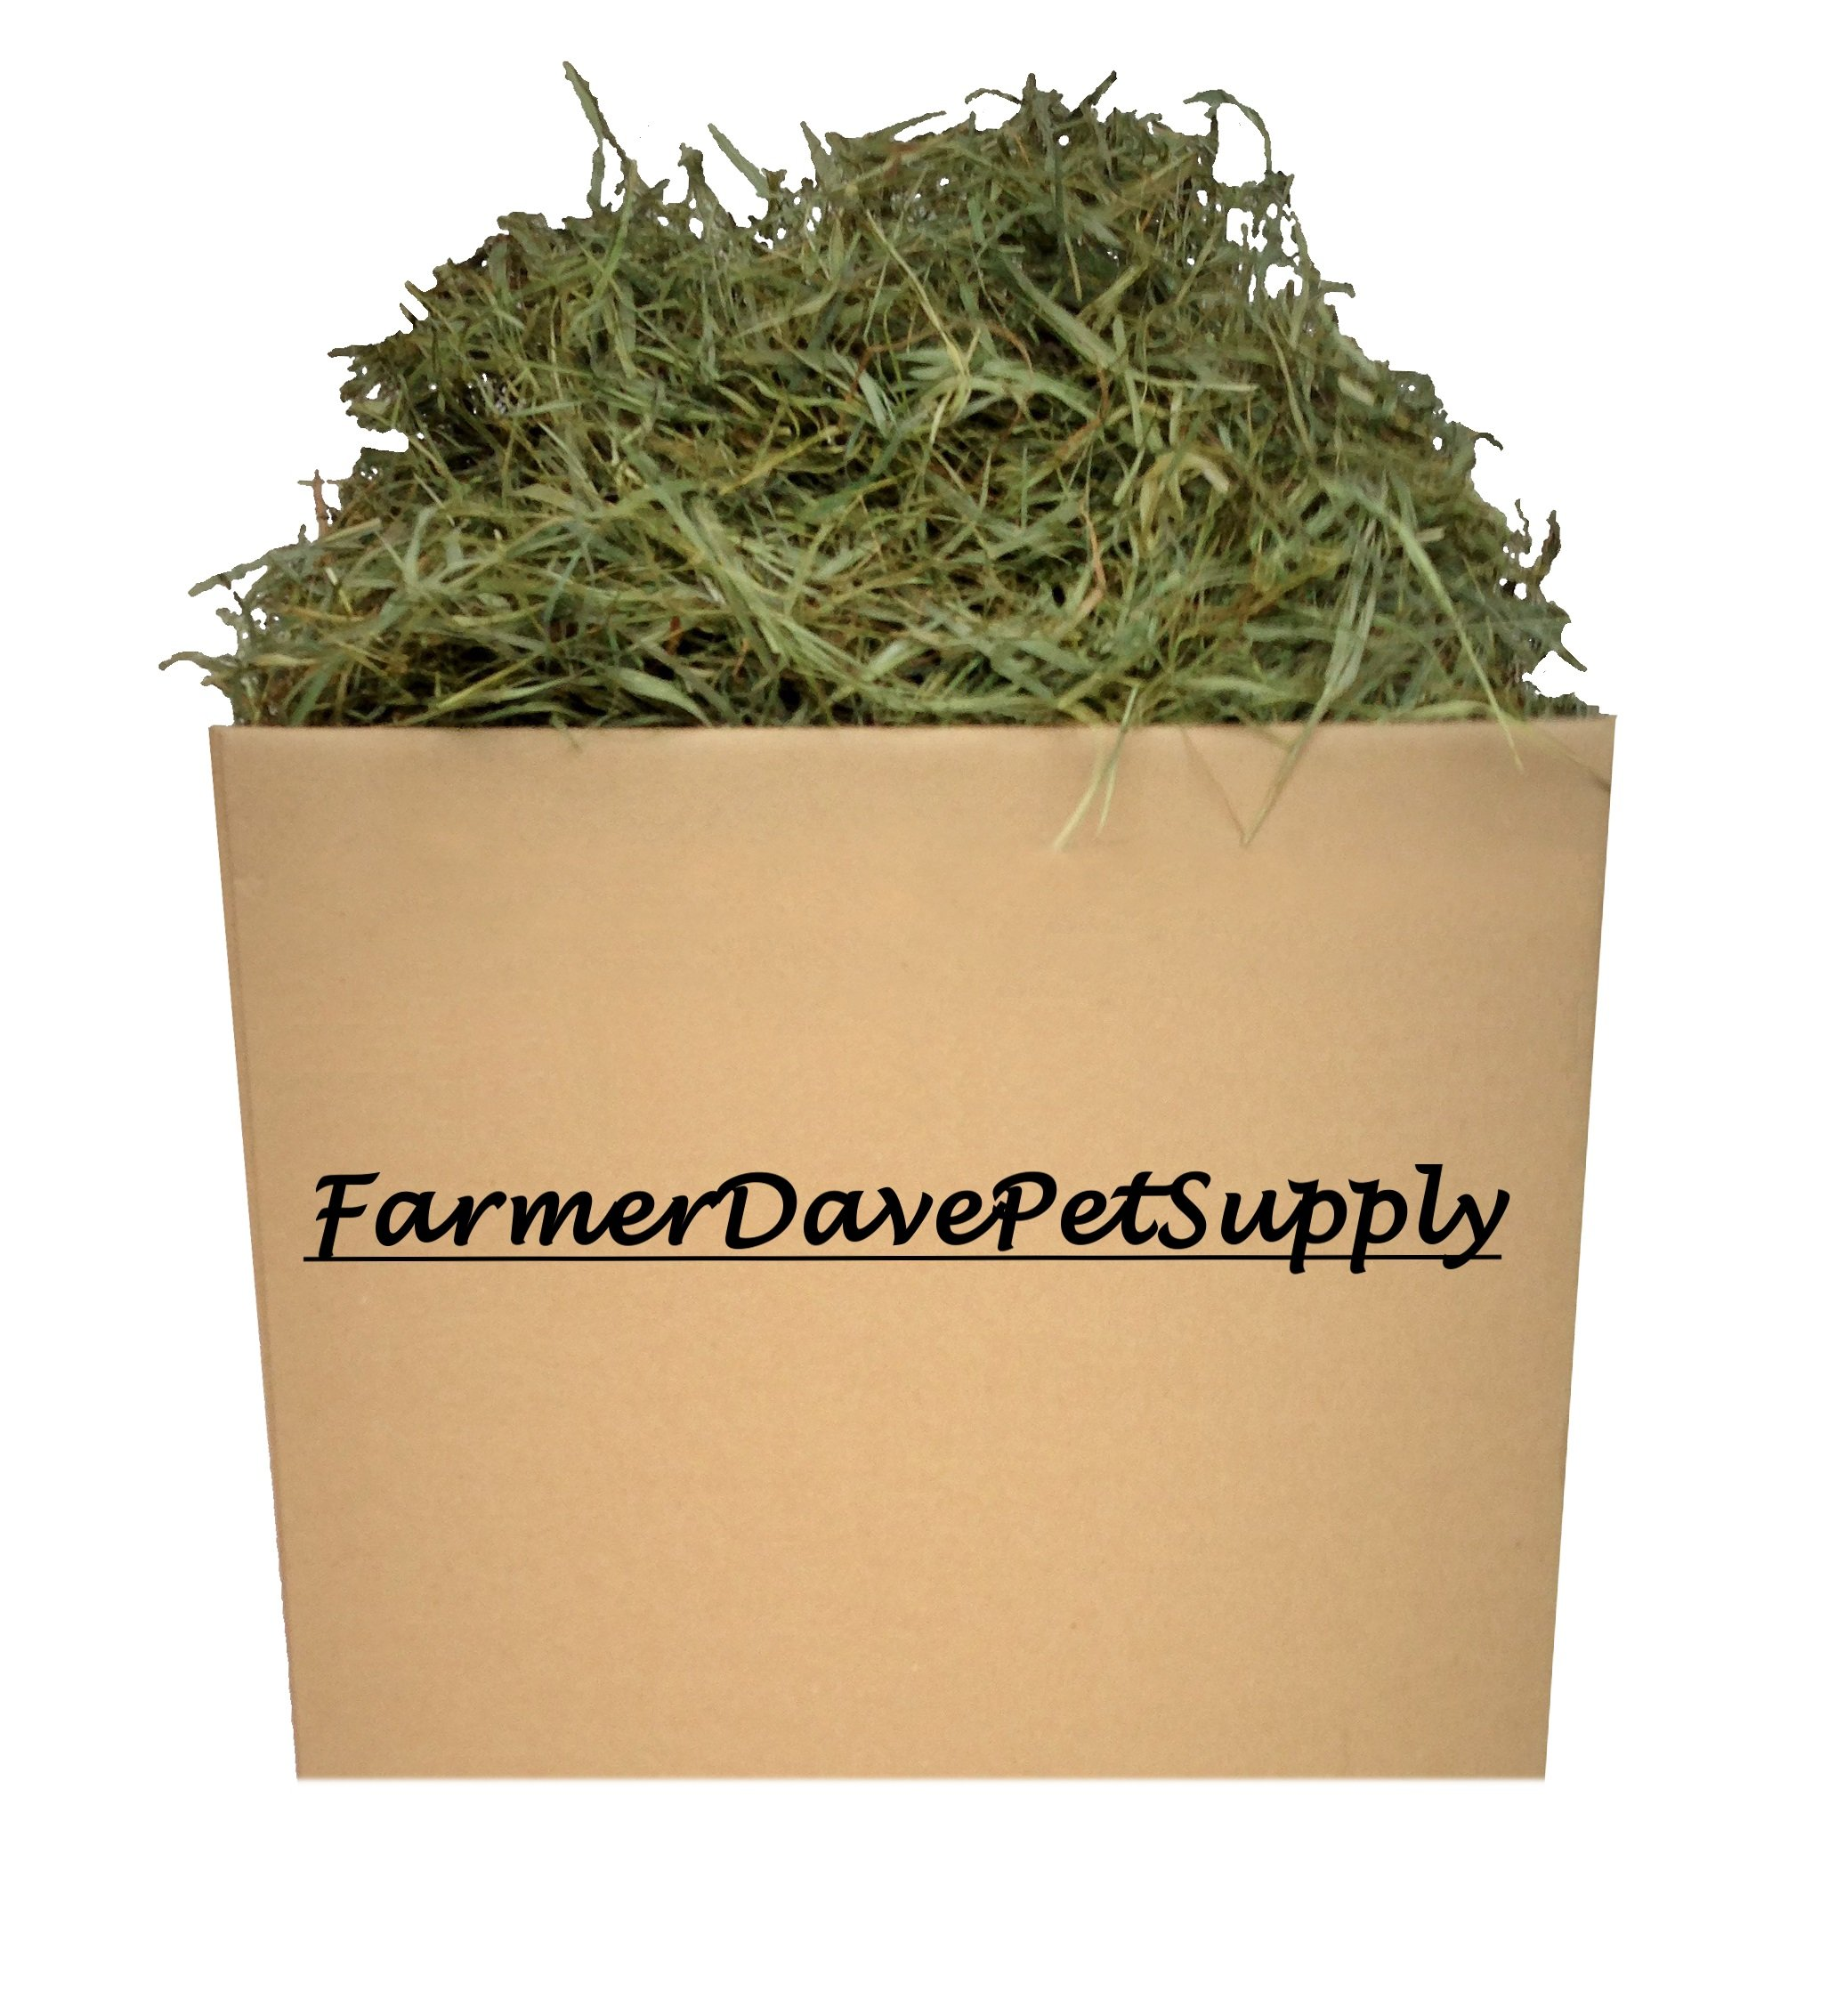 FarmerDavePetSupply 15 Lb Second Cut Timothy Hay, Bunny, Guinea Pig and Chinchilla Hay by FarmerDavePetSupply